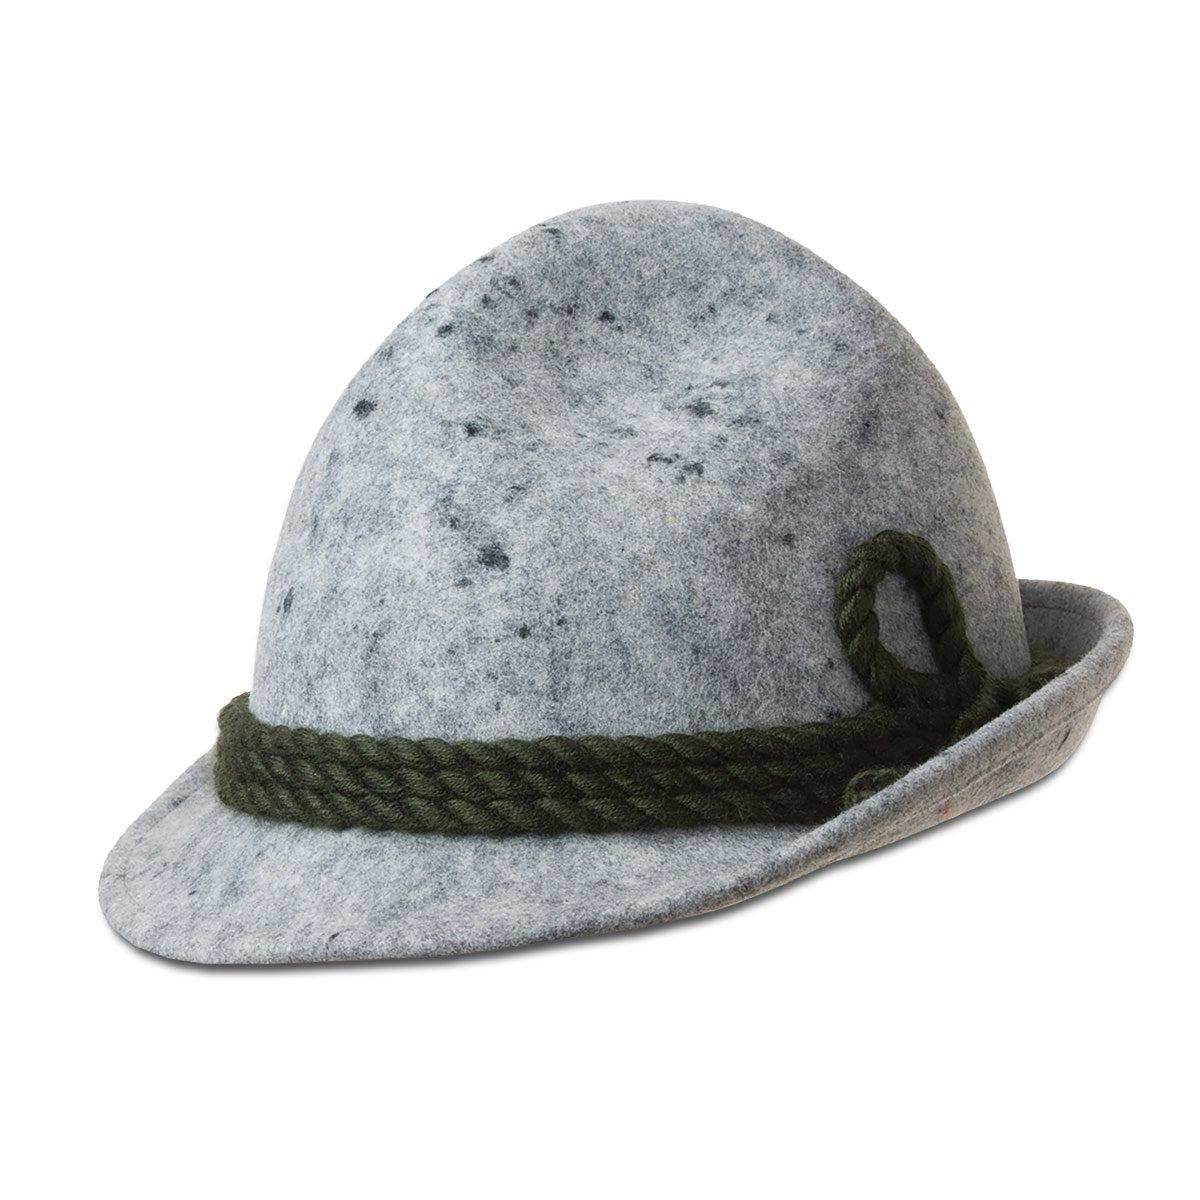 hat in rustic style 5e08df9498ba